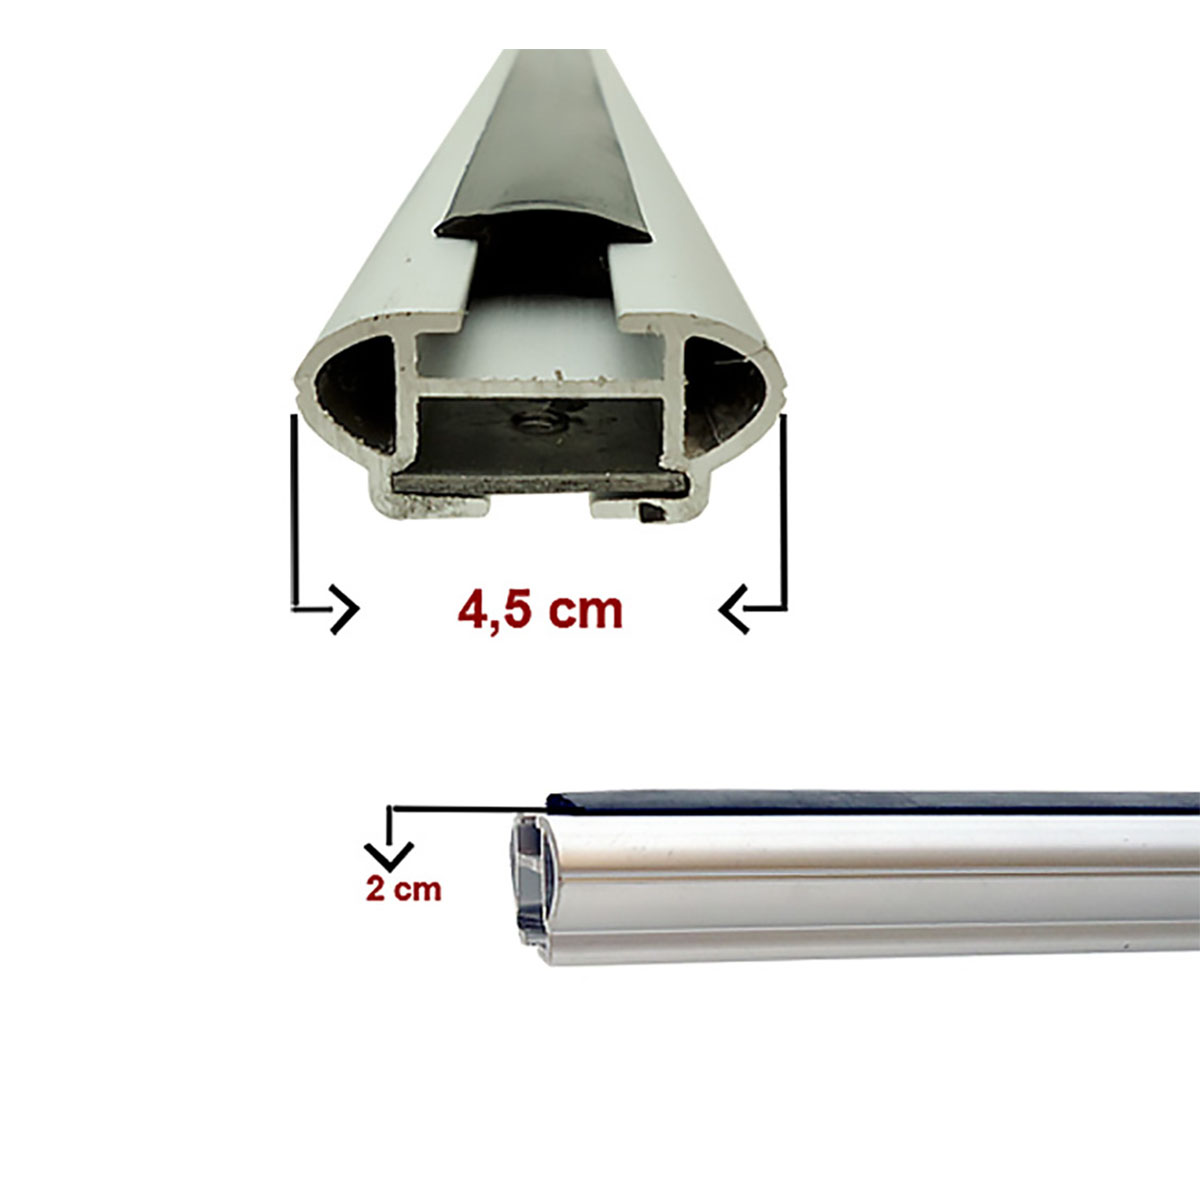 Travessa rack de teto larga alumínio Sorento 2010 a 2013